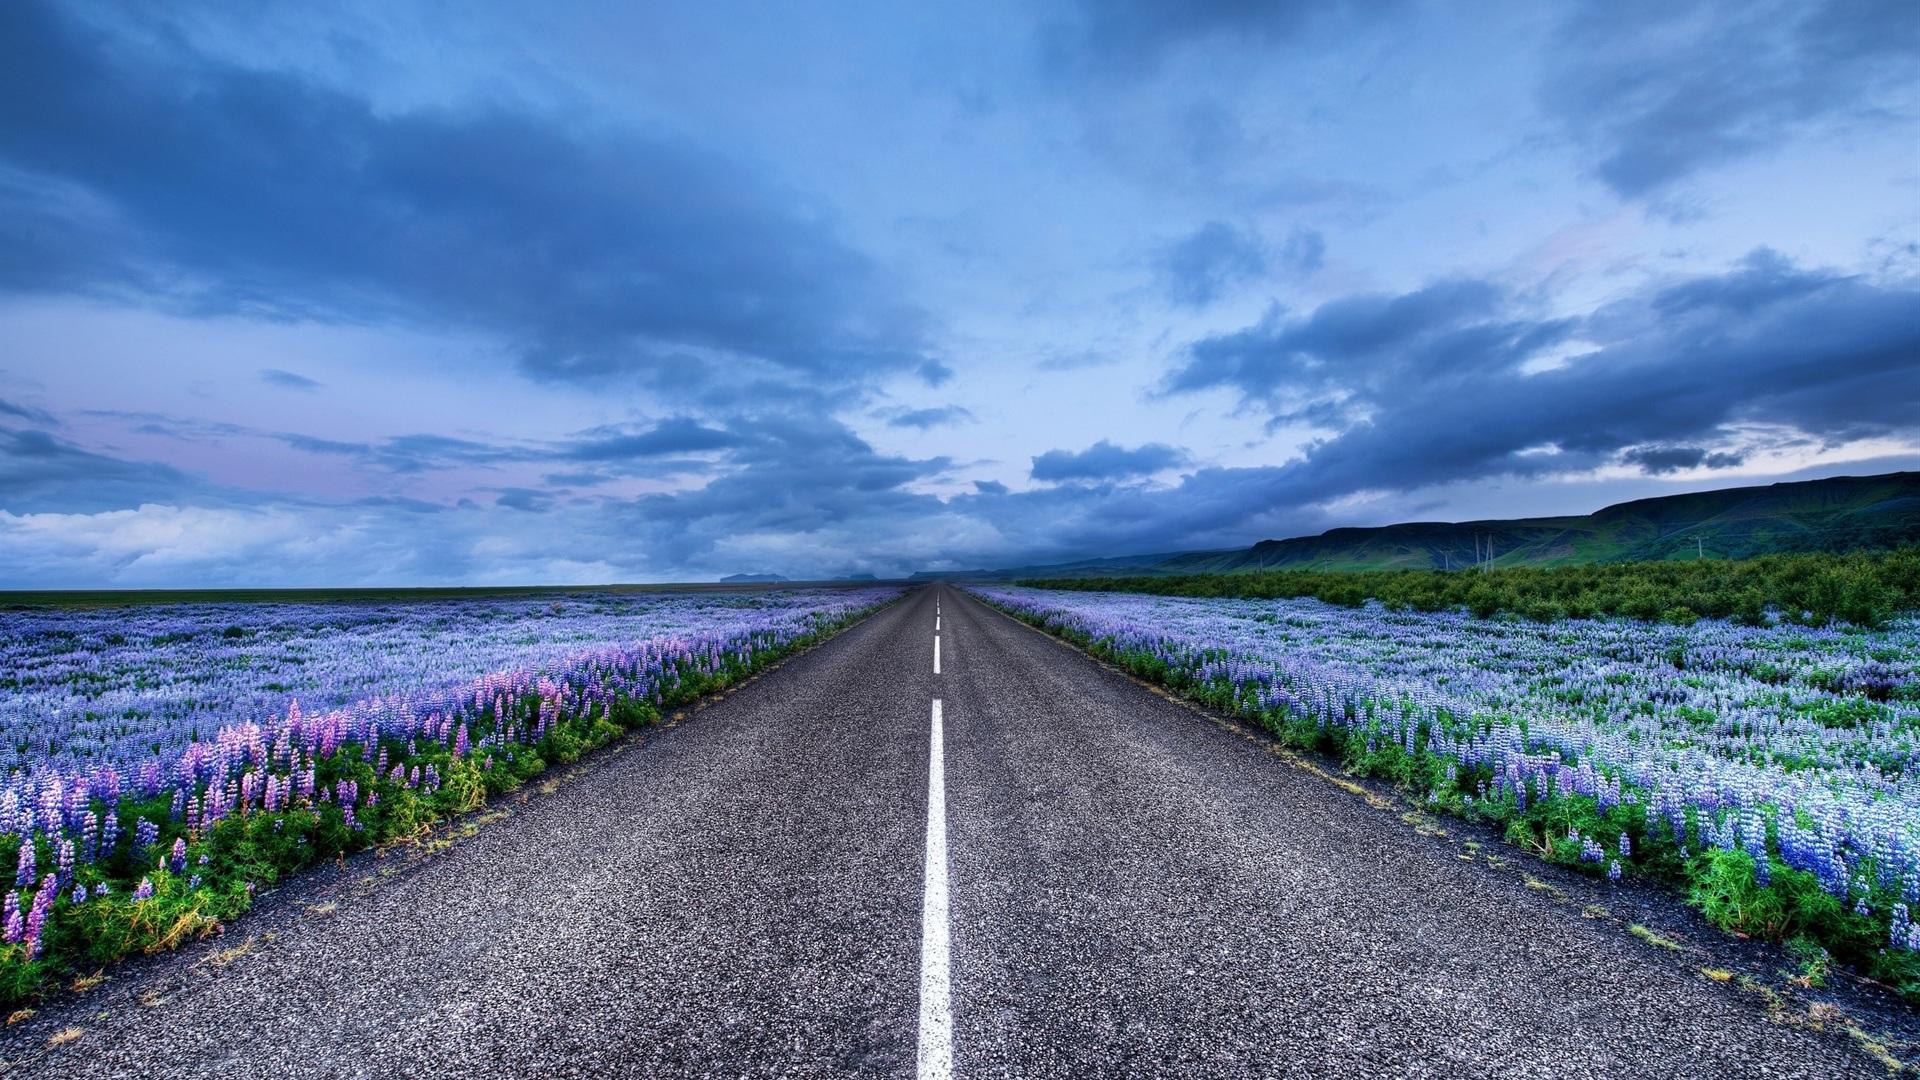 Iceland S Ring Road Wallpapers: Iceland Desktop Wallpaper